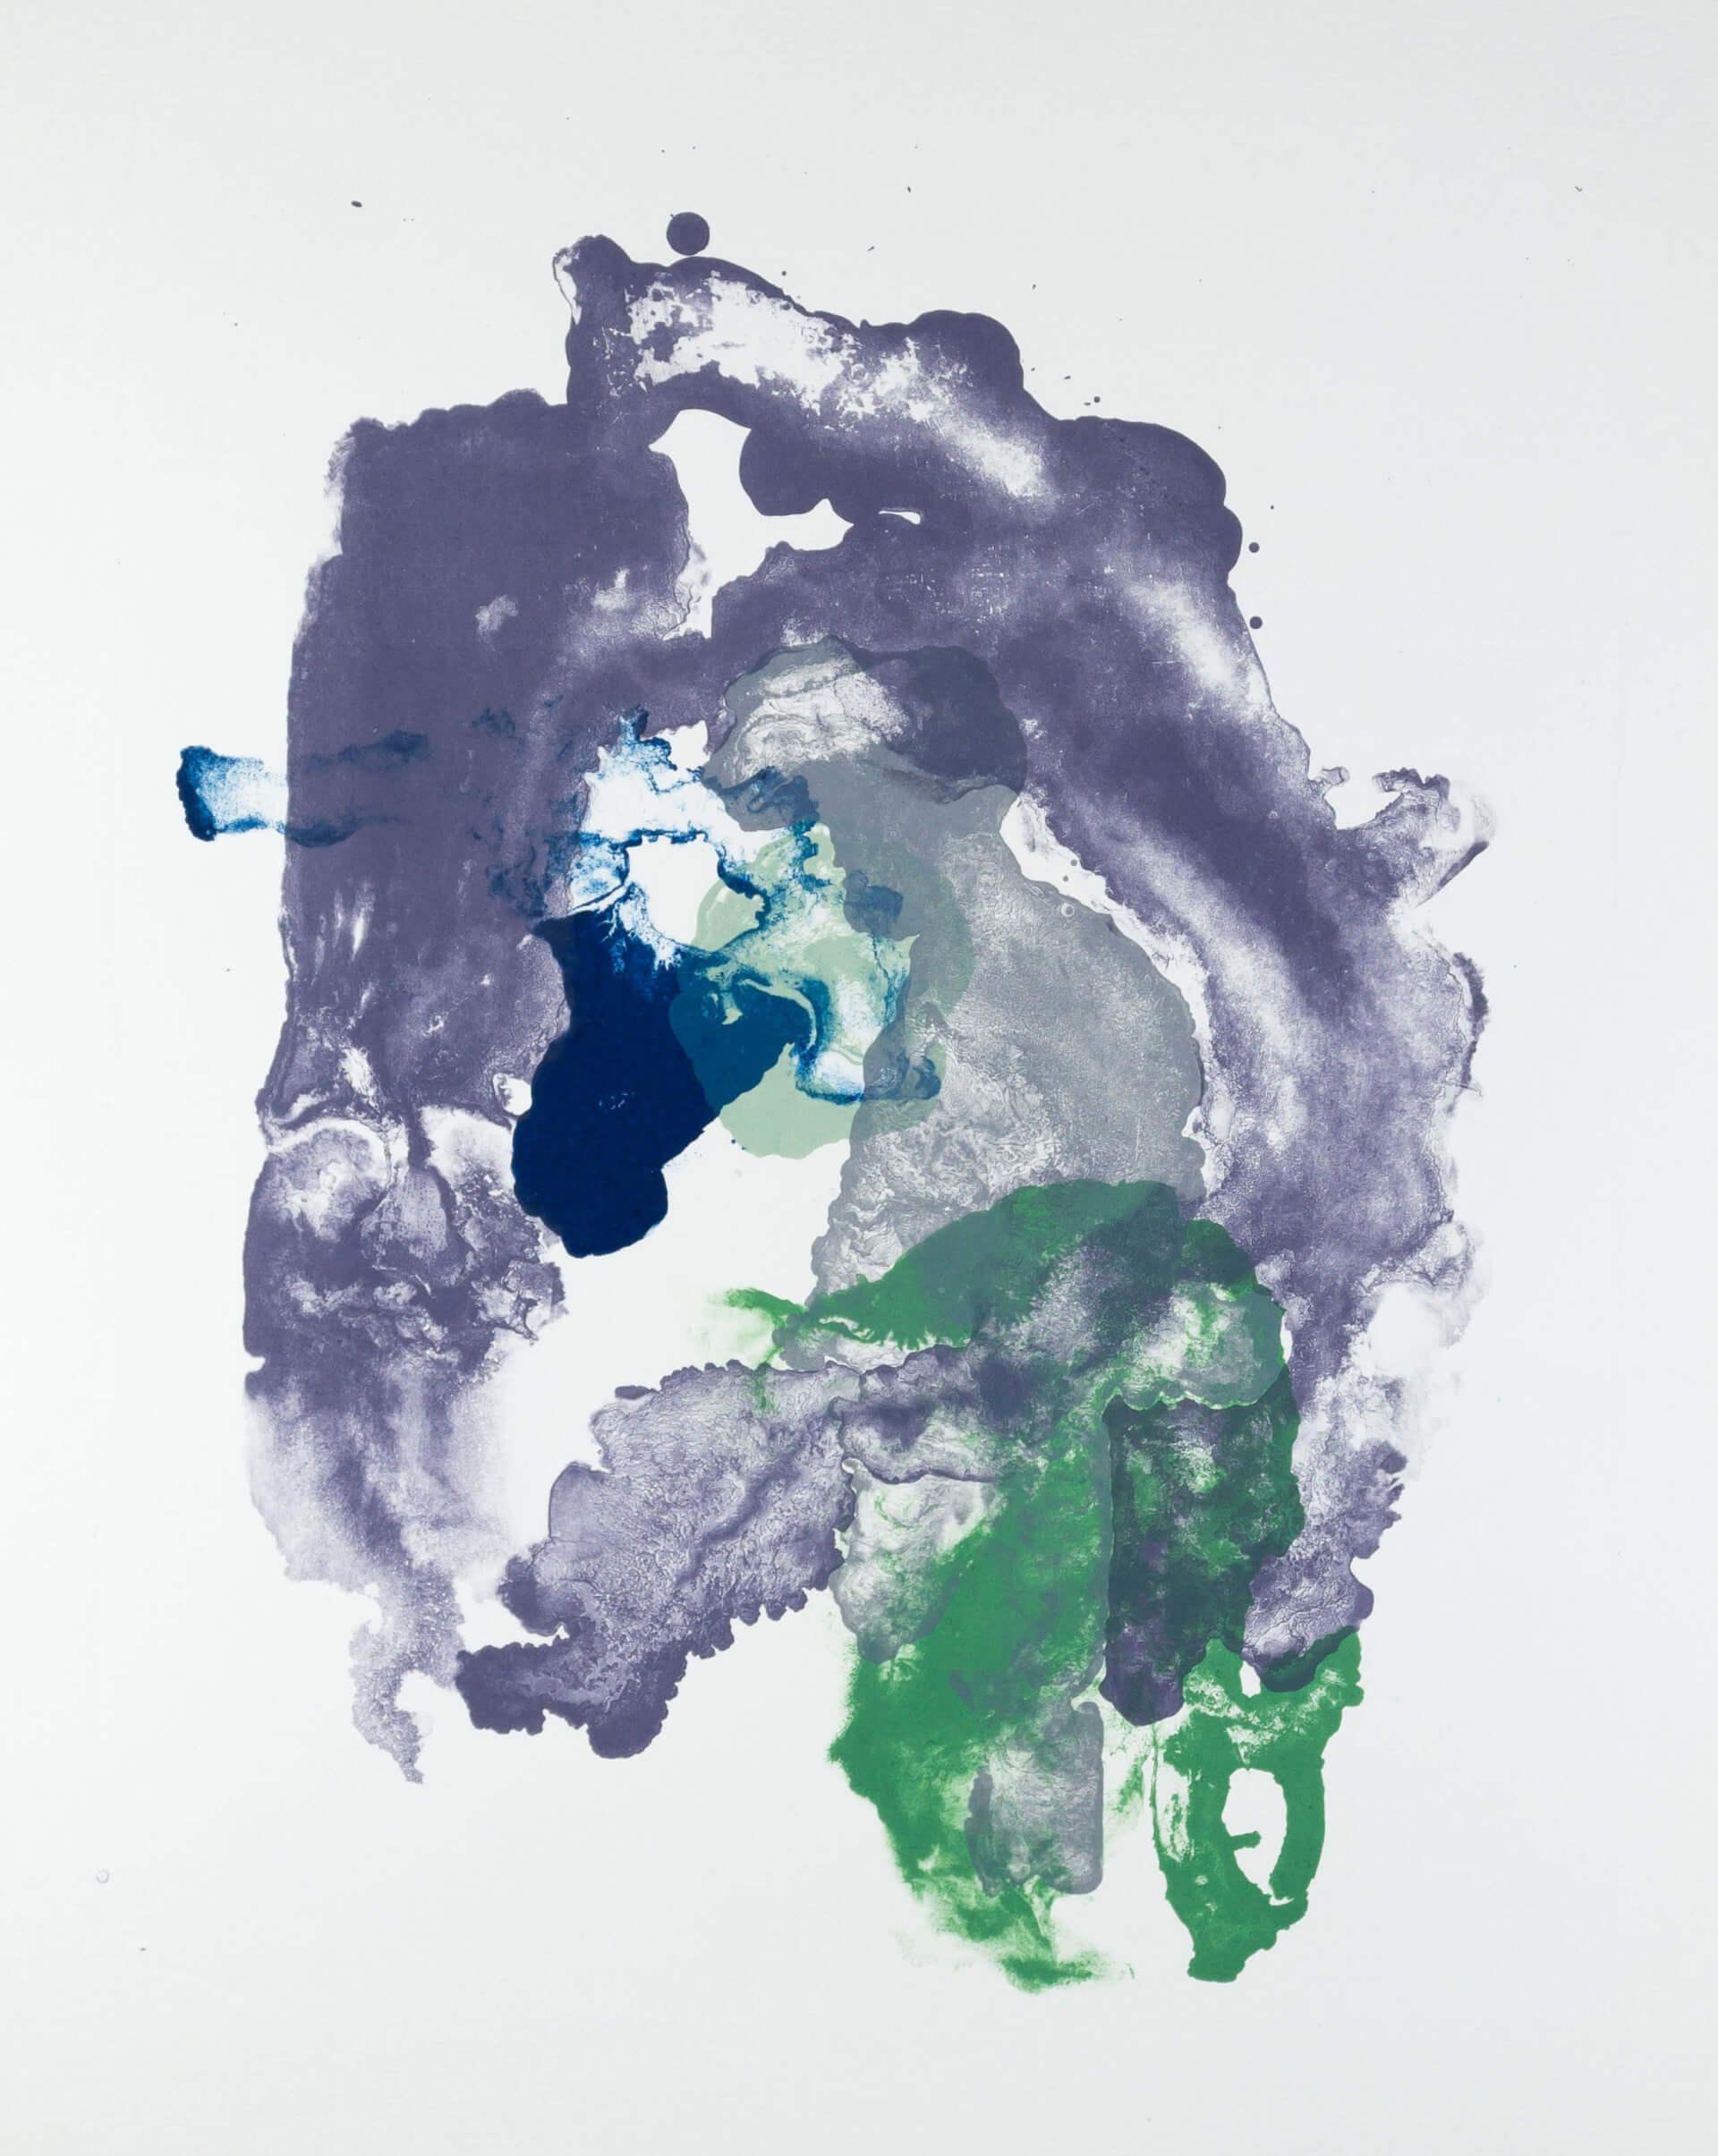 Katharina Albers, organism (growing)(E), 2017, Farblithographie, Unikat, 56x45 cm